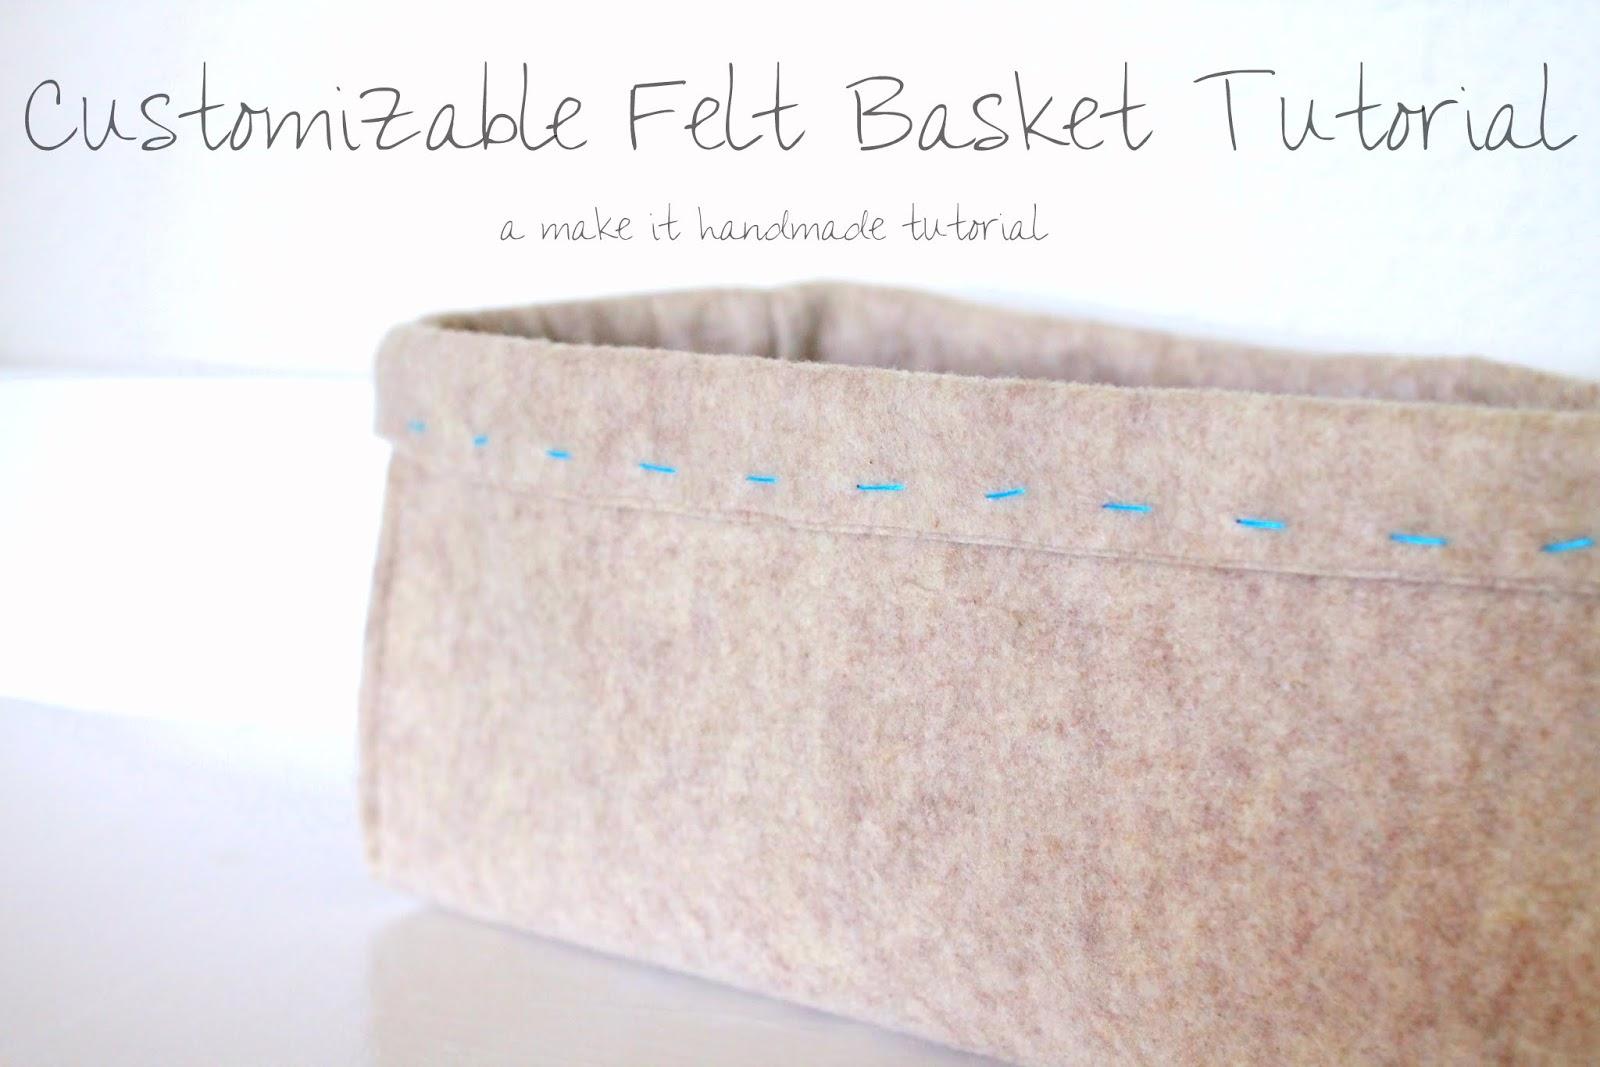 Handmade Basket Tutorial : Make it handmade felt baskets in any size tutorial